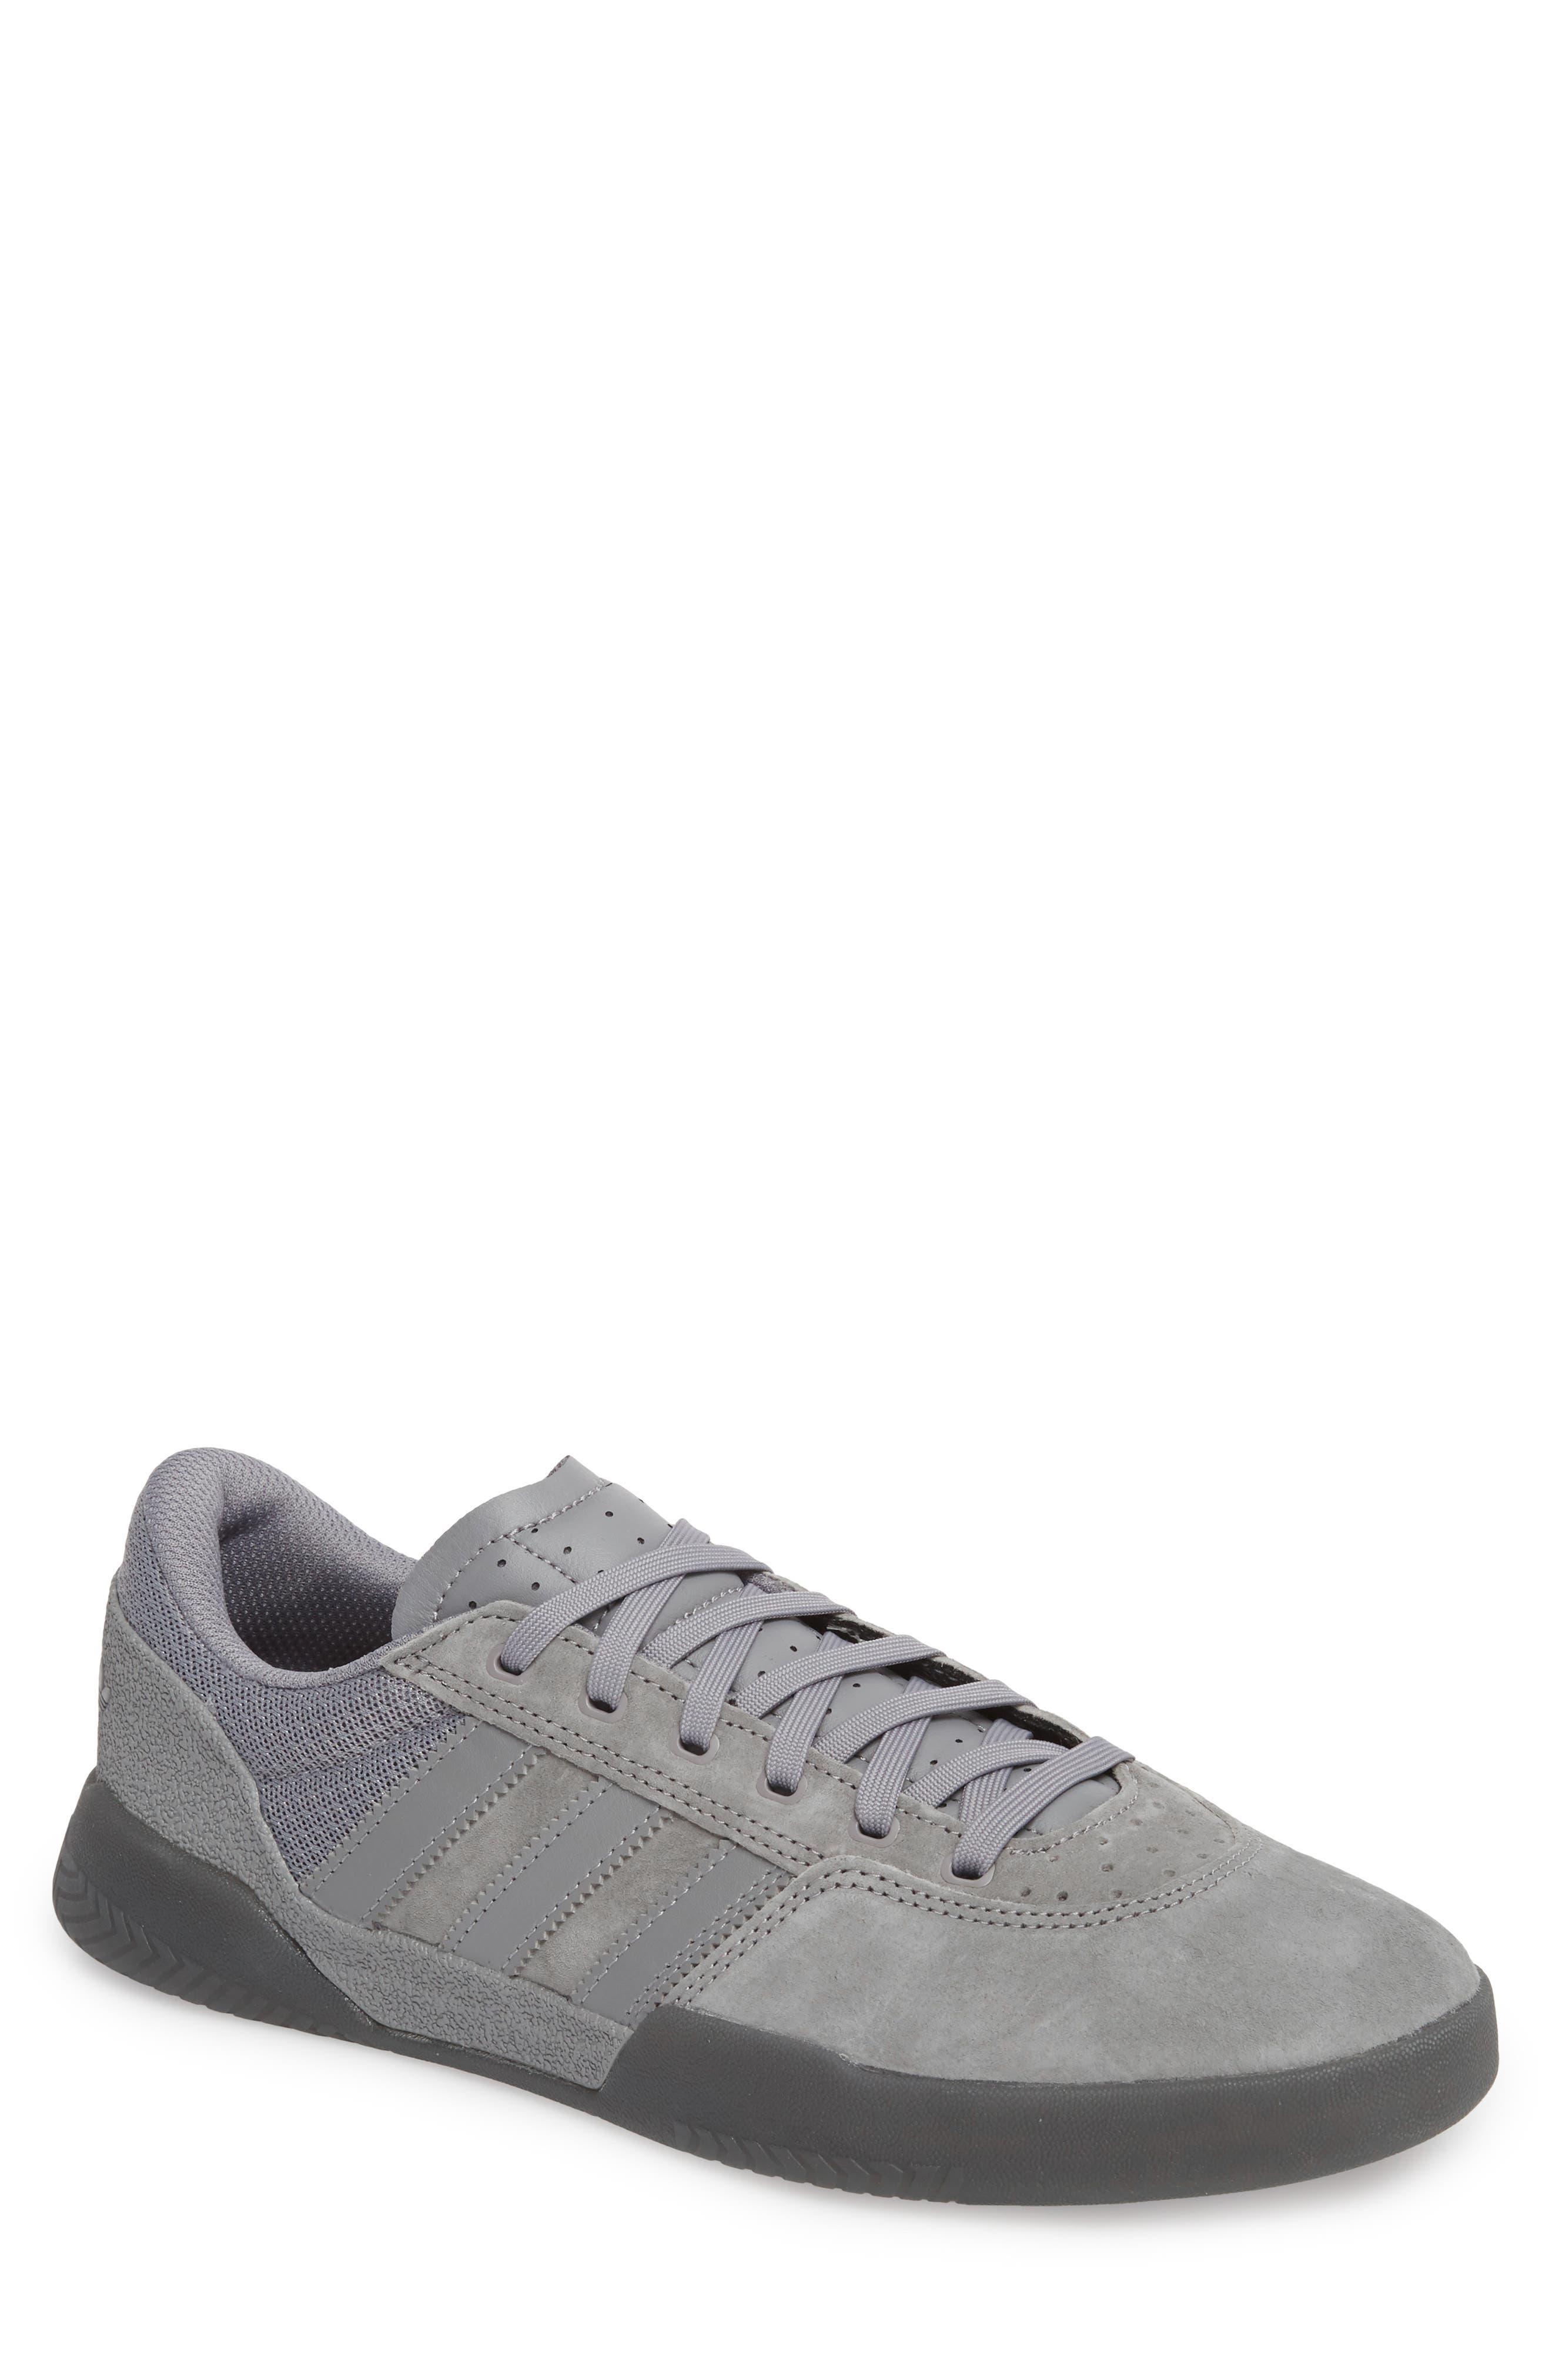 City Cup Sneaker,                         Main,                         color, 036